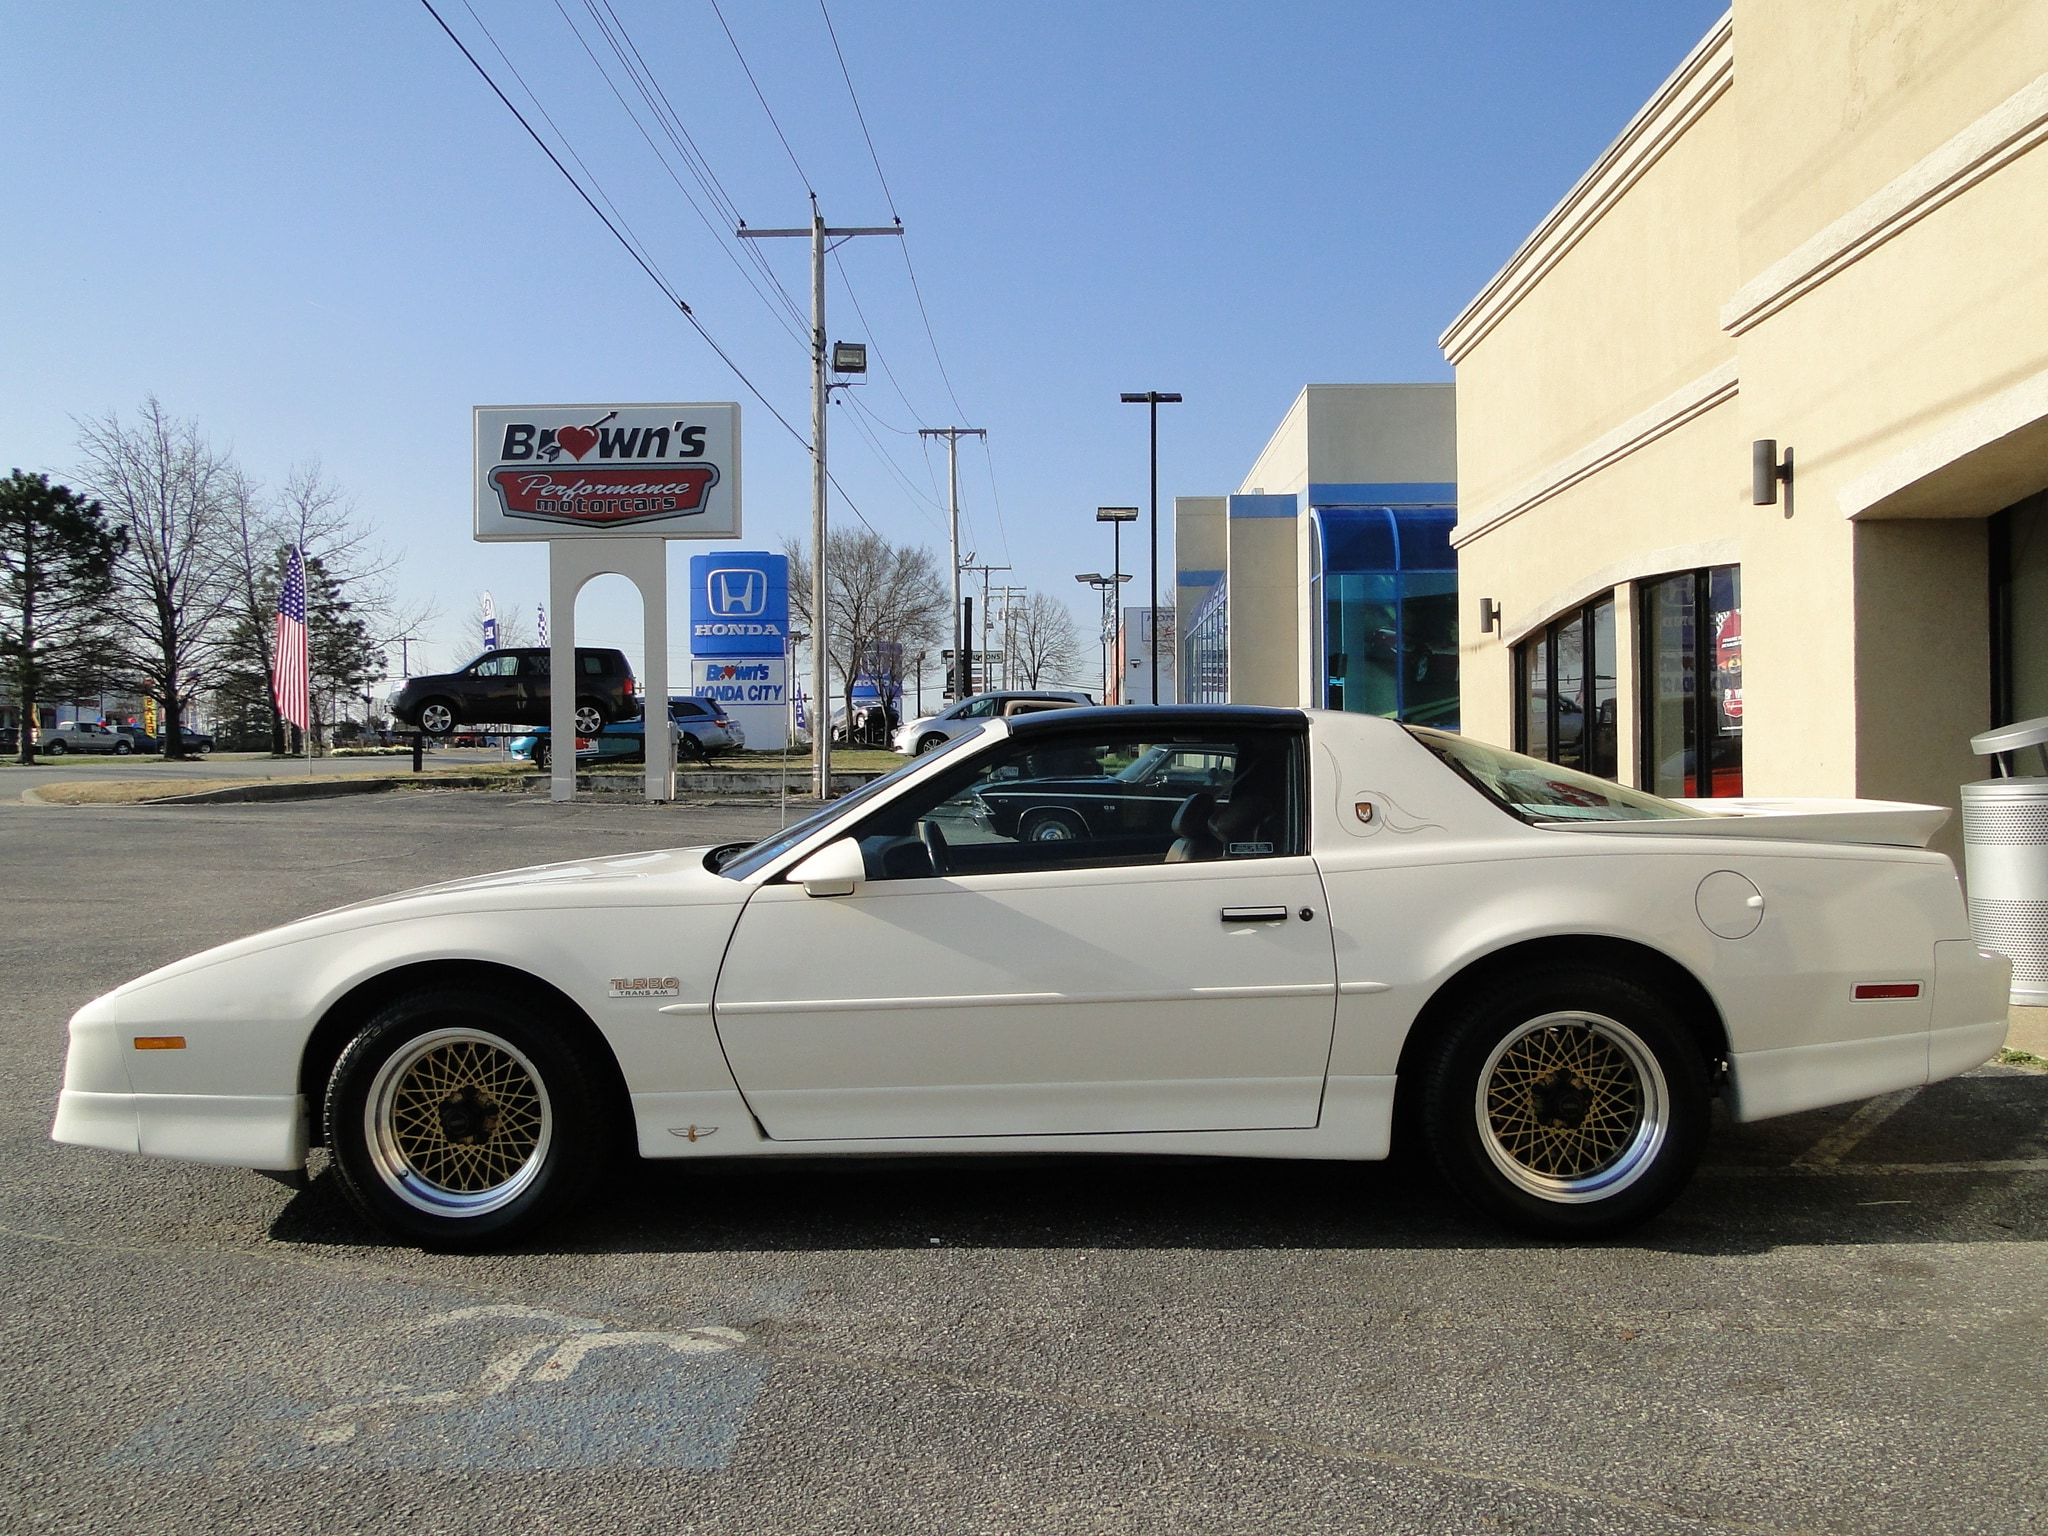 used cars in glen burnie maryland annapolis md baltimore autos weblog. Black Bedroom Furniture Sets. Home Design Ideas